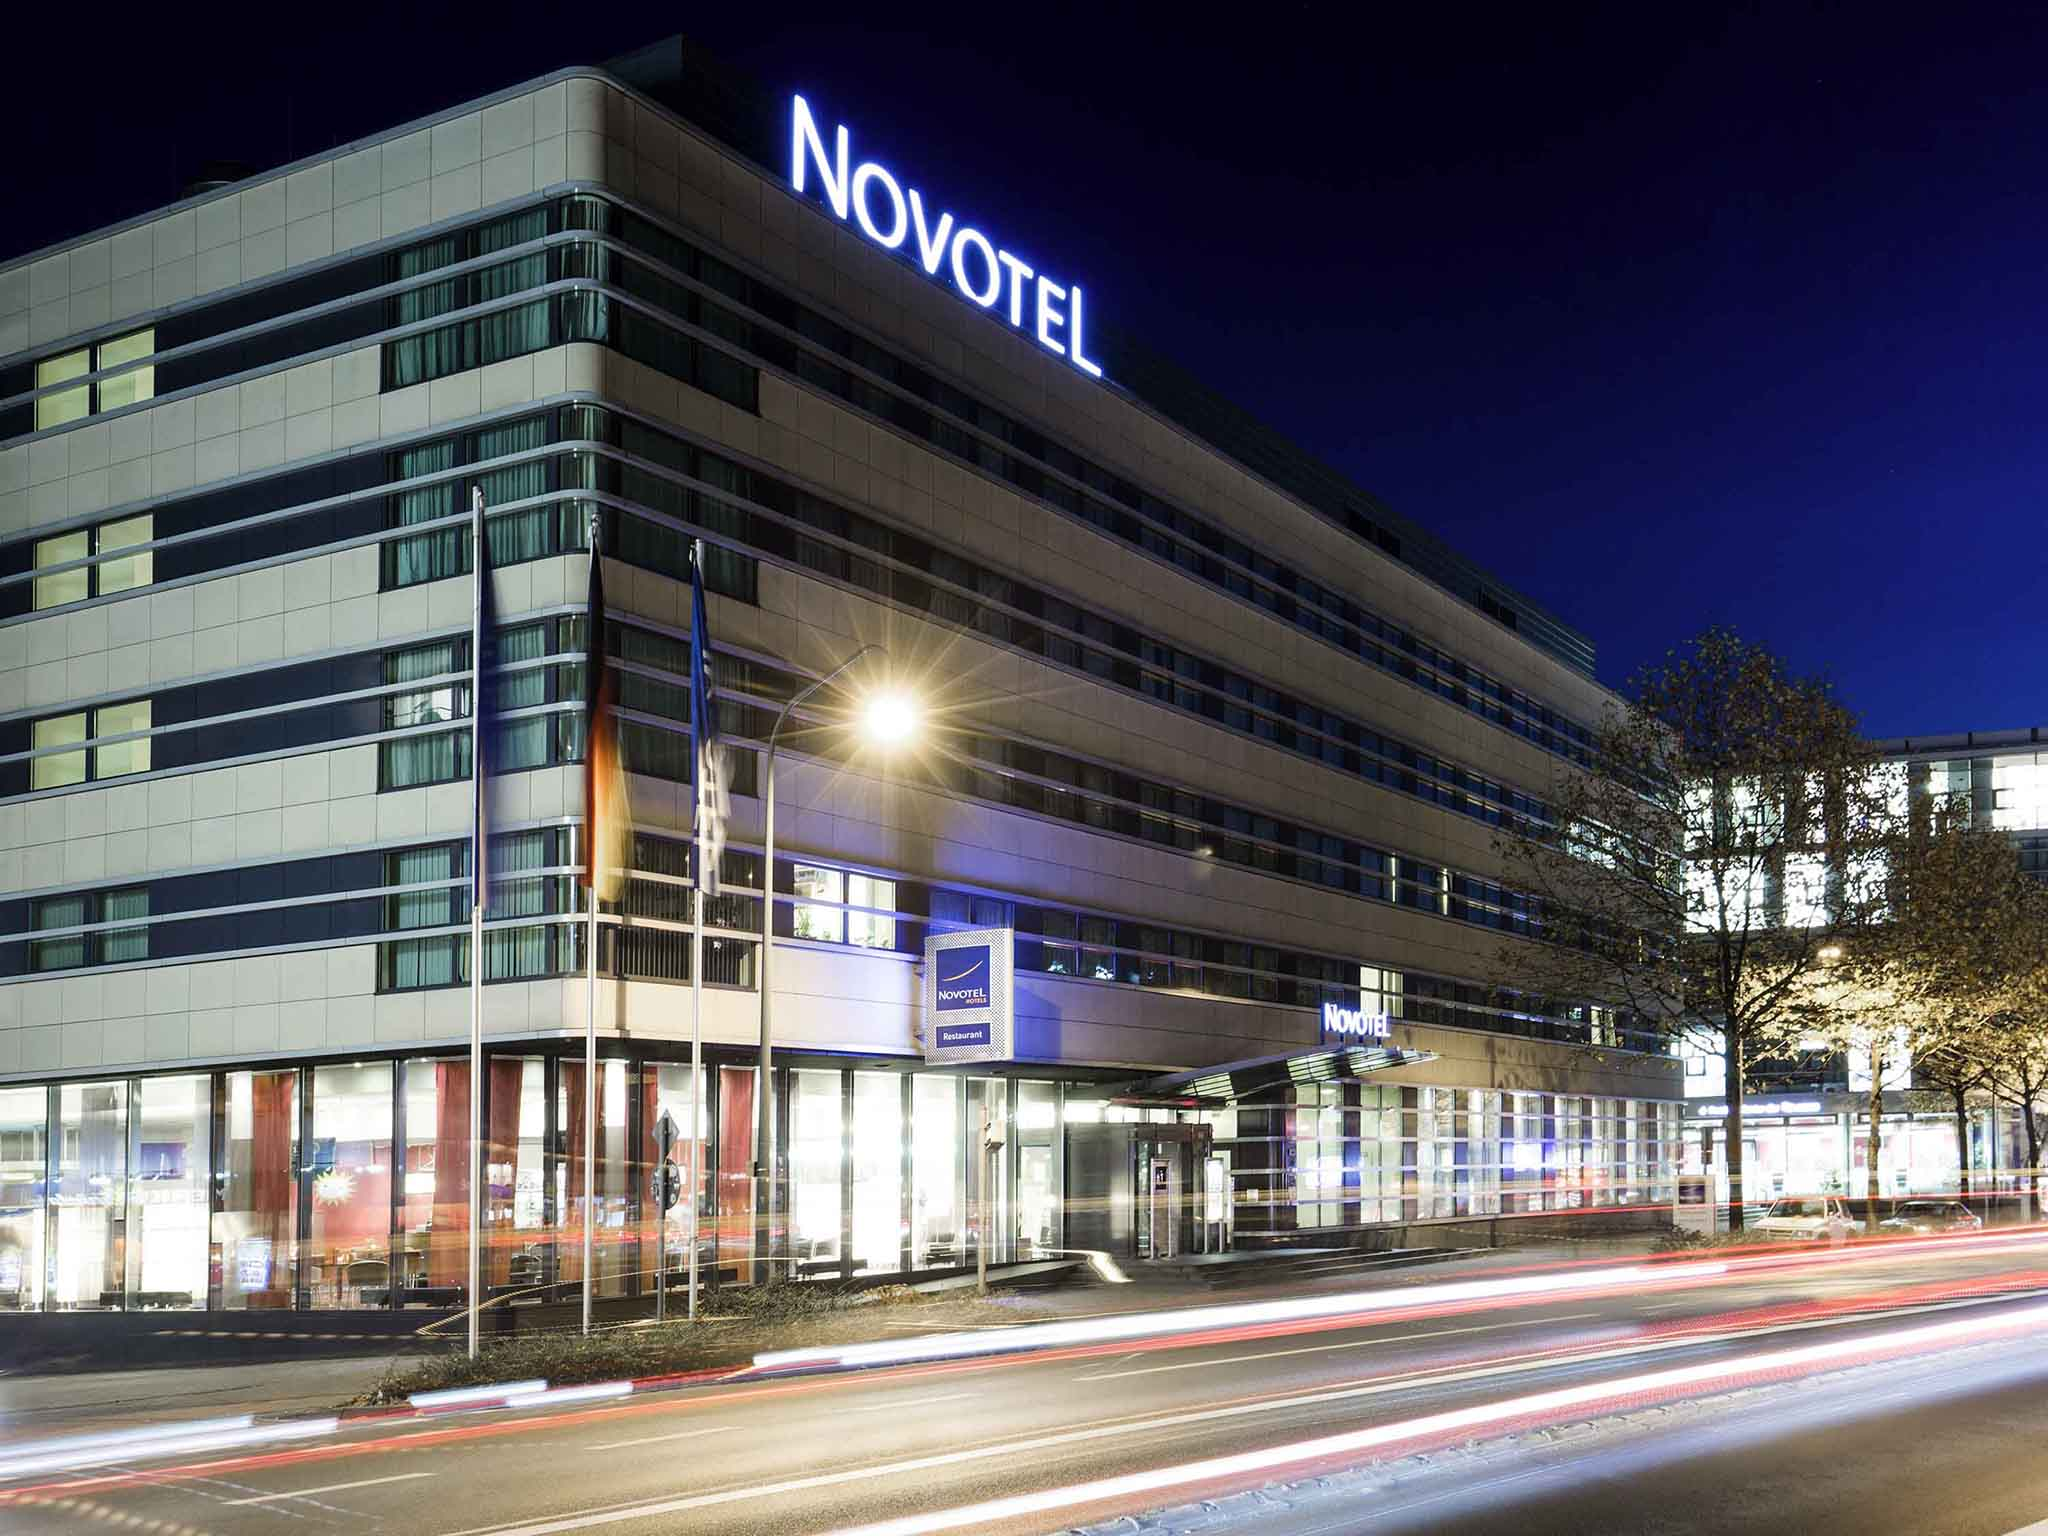 فندق - Novotel Aachen City